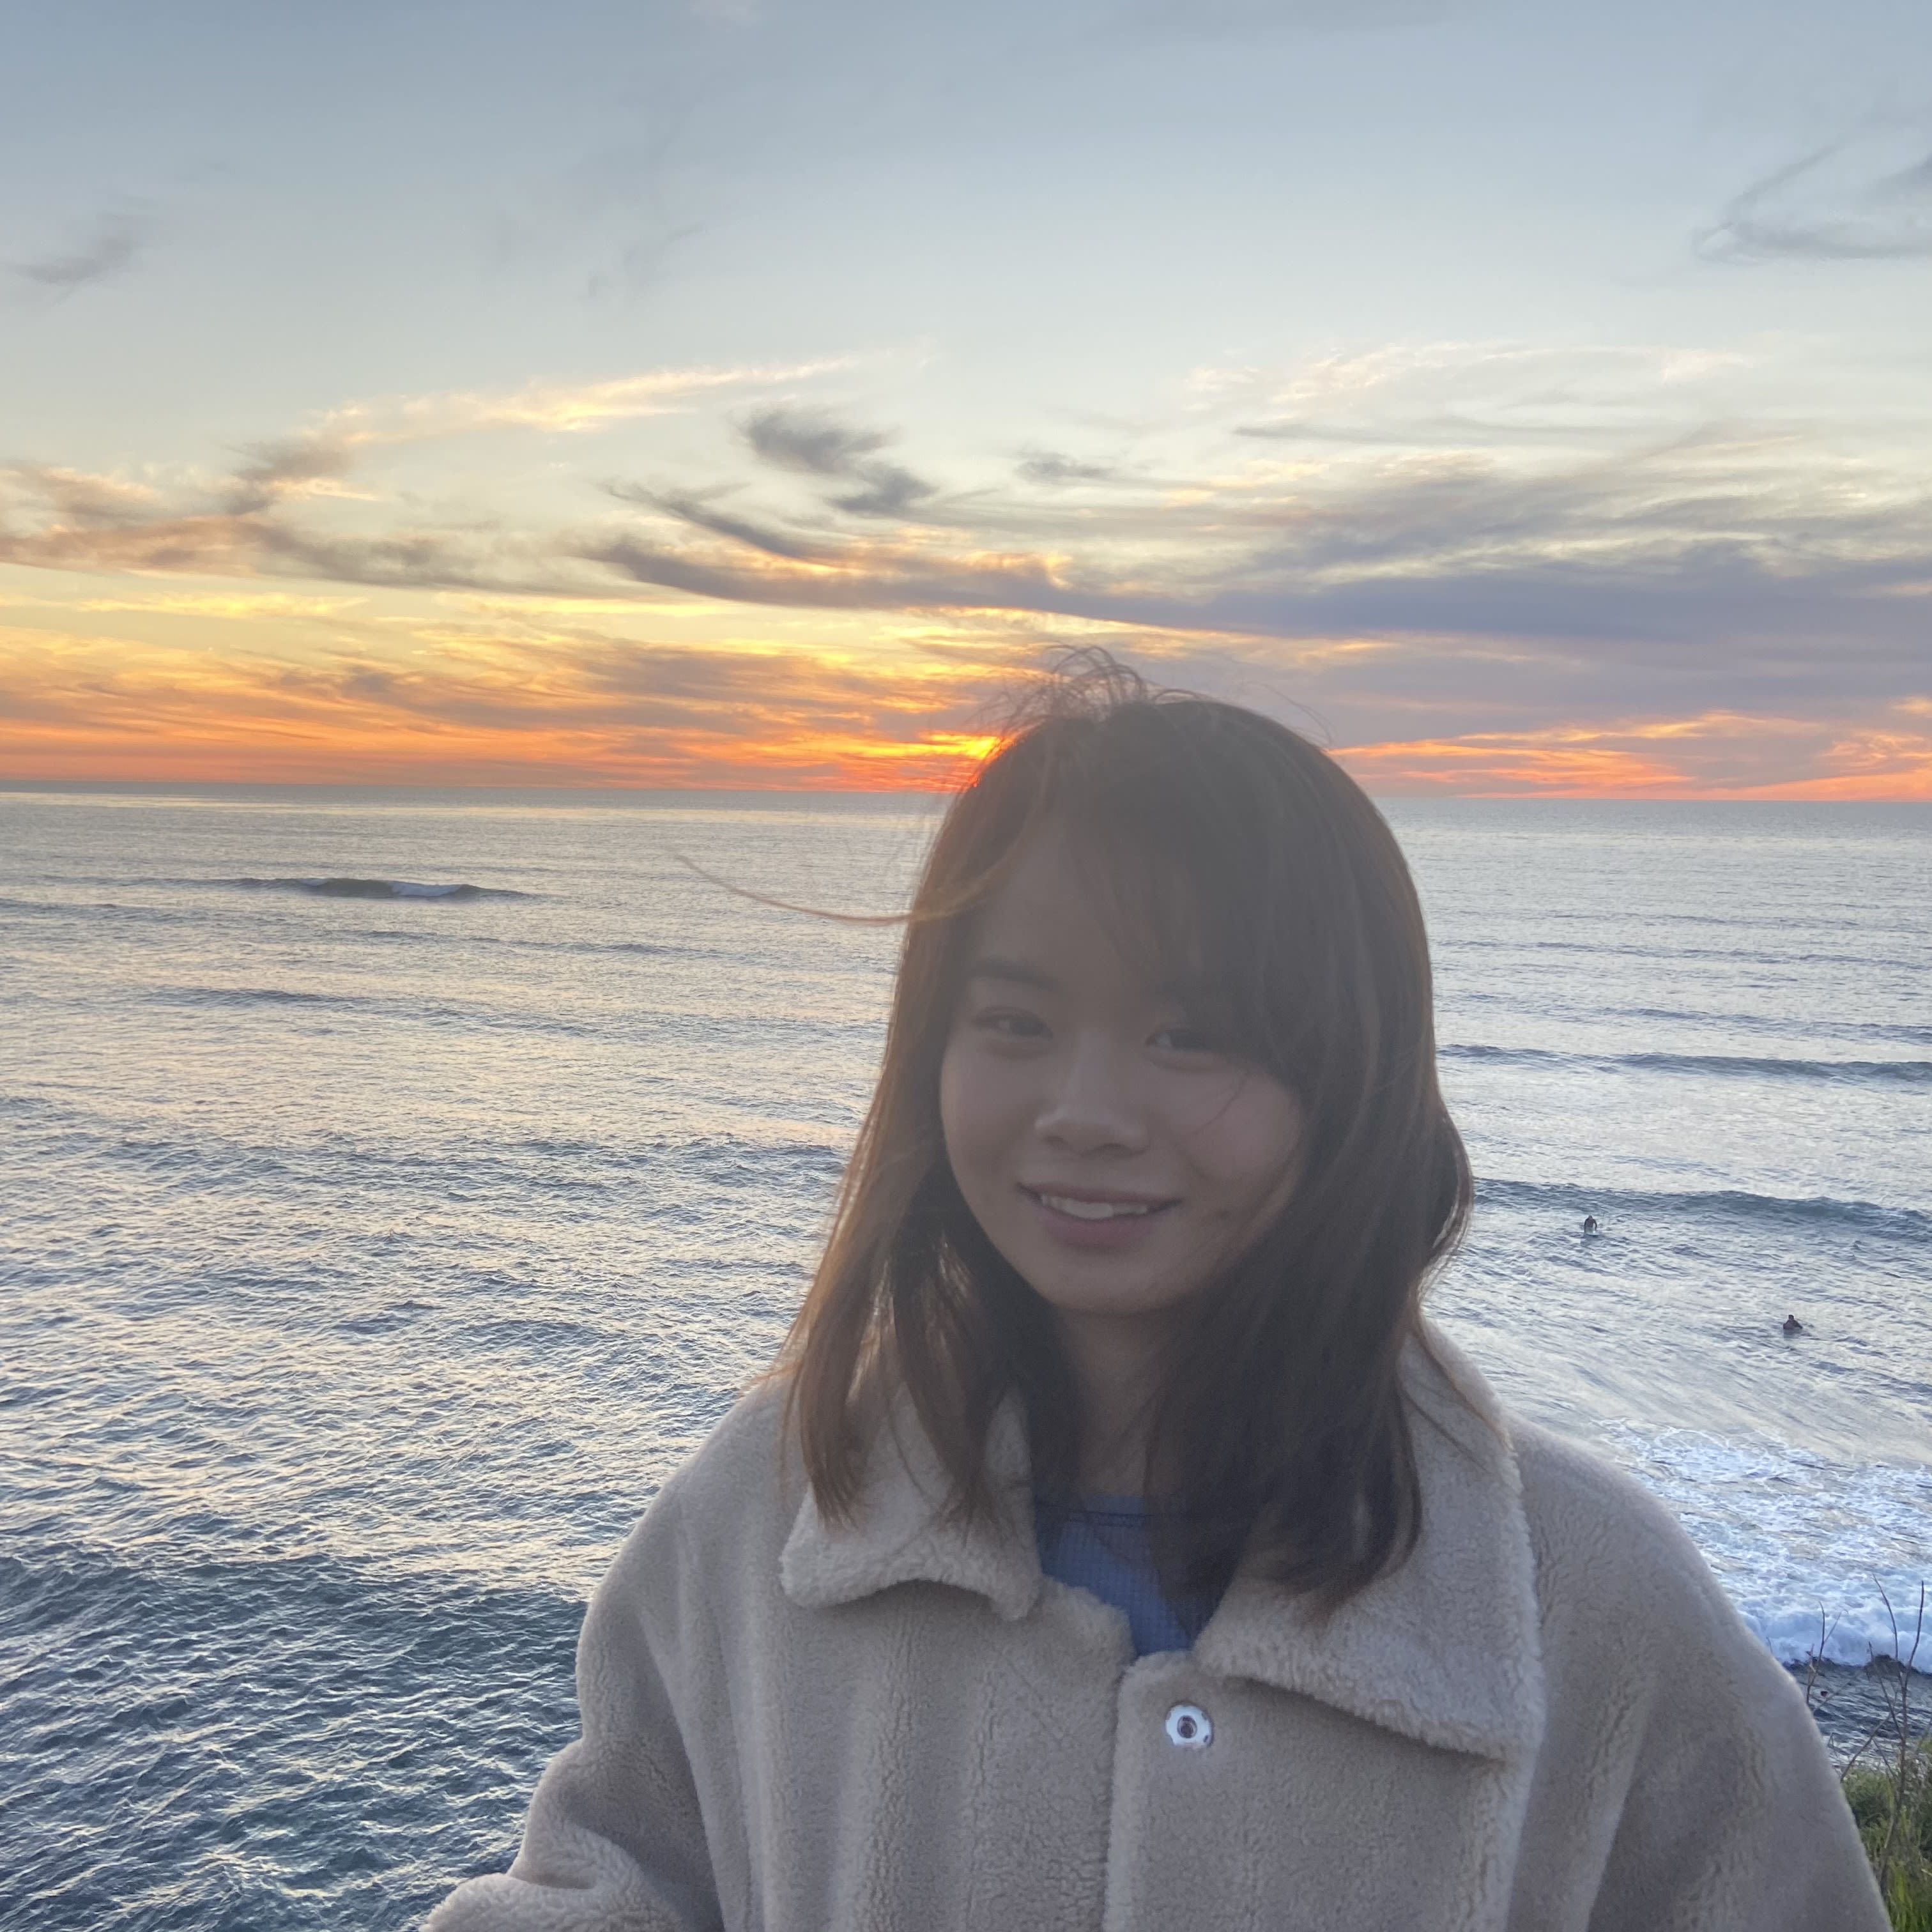 Melody Yao from University of Southern California